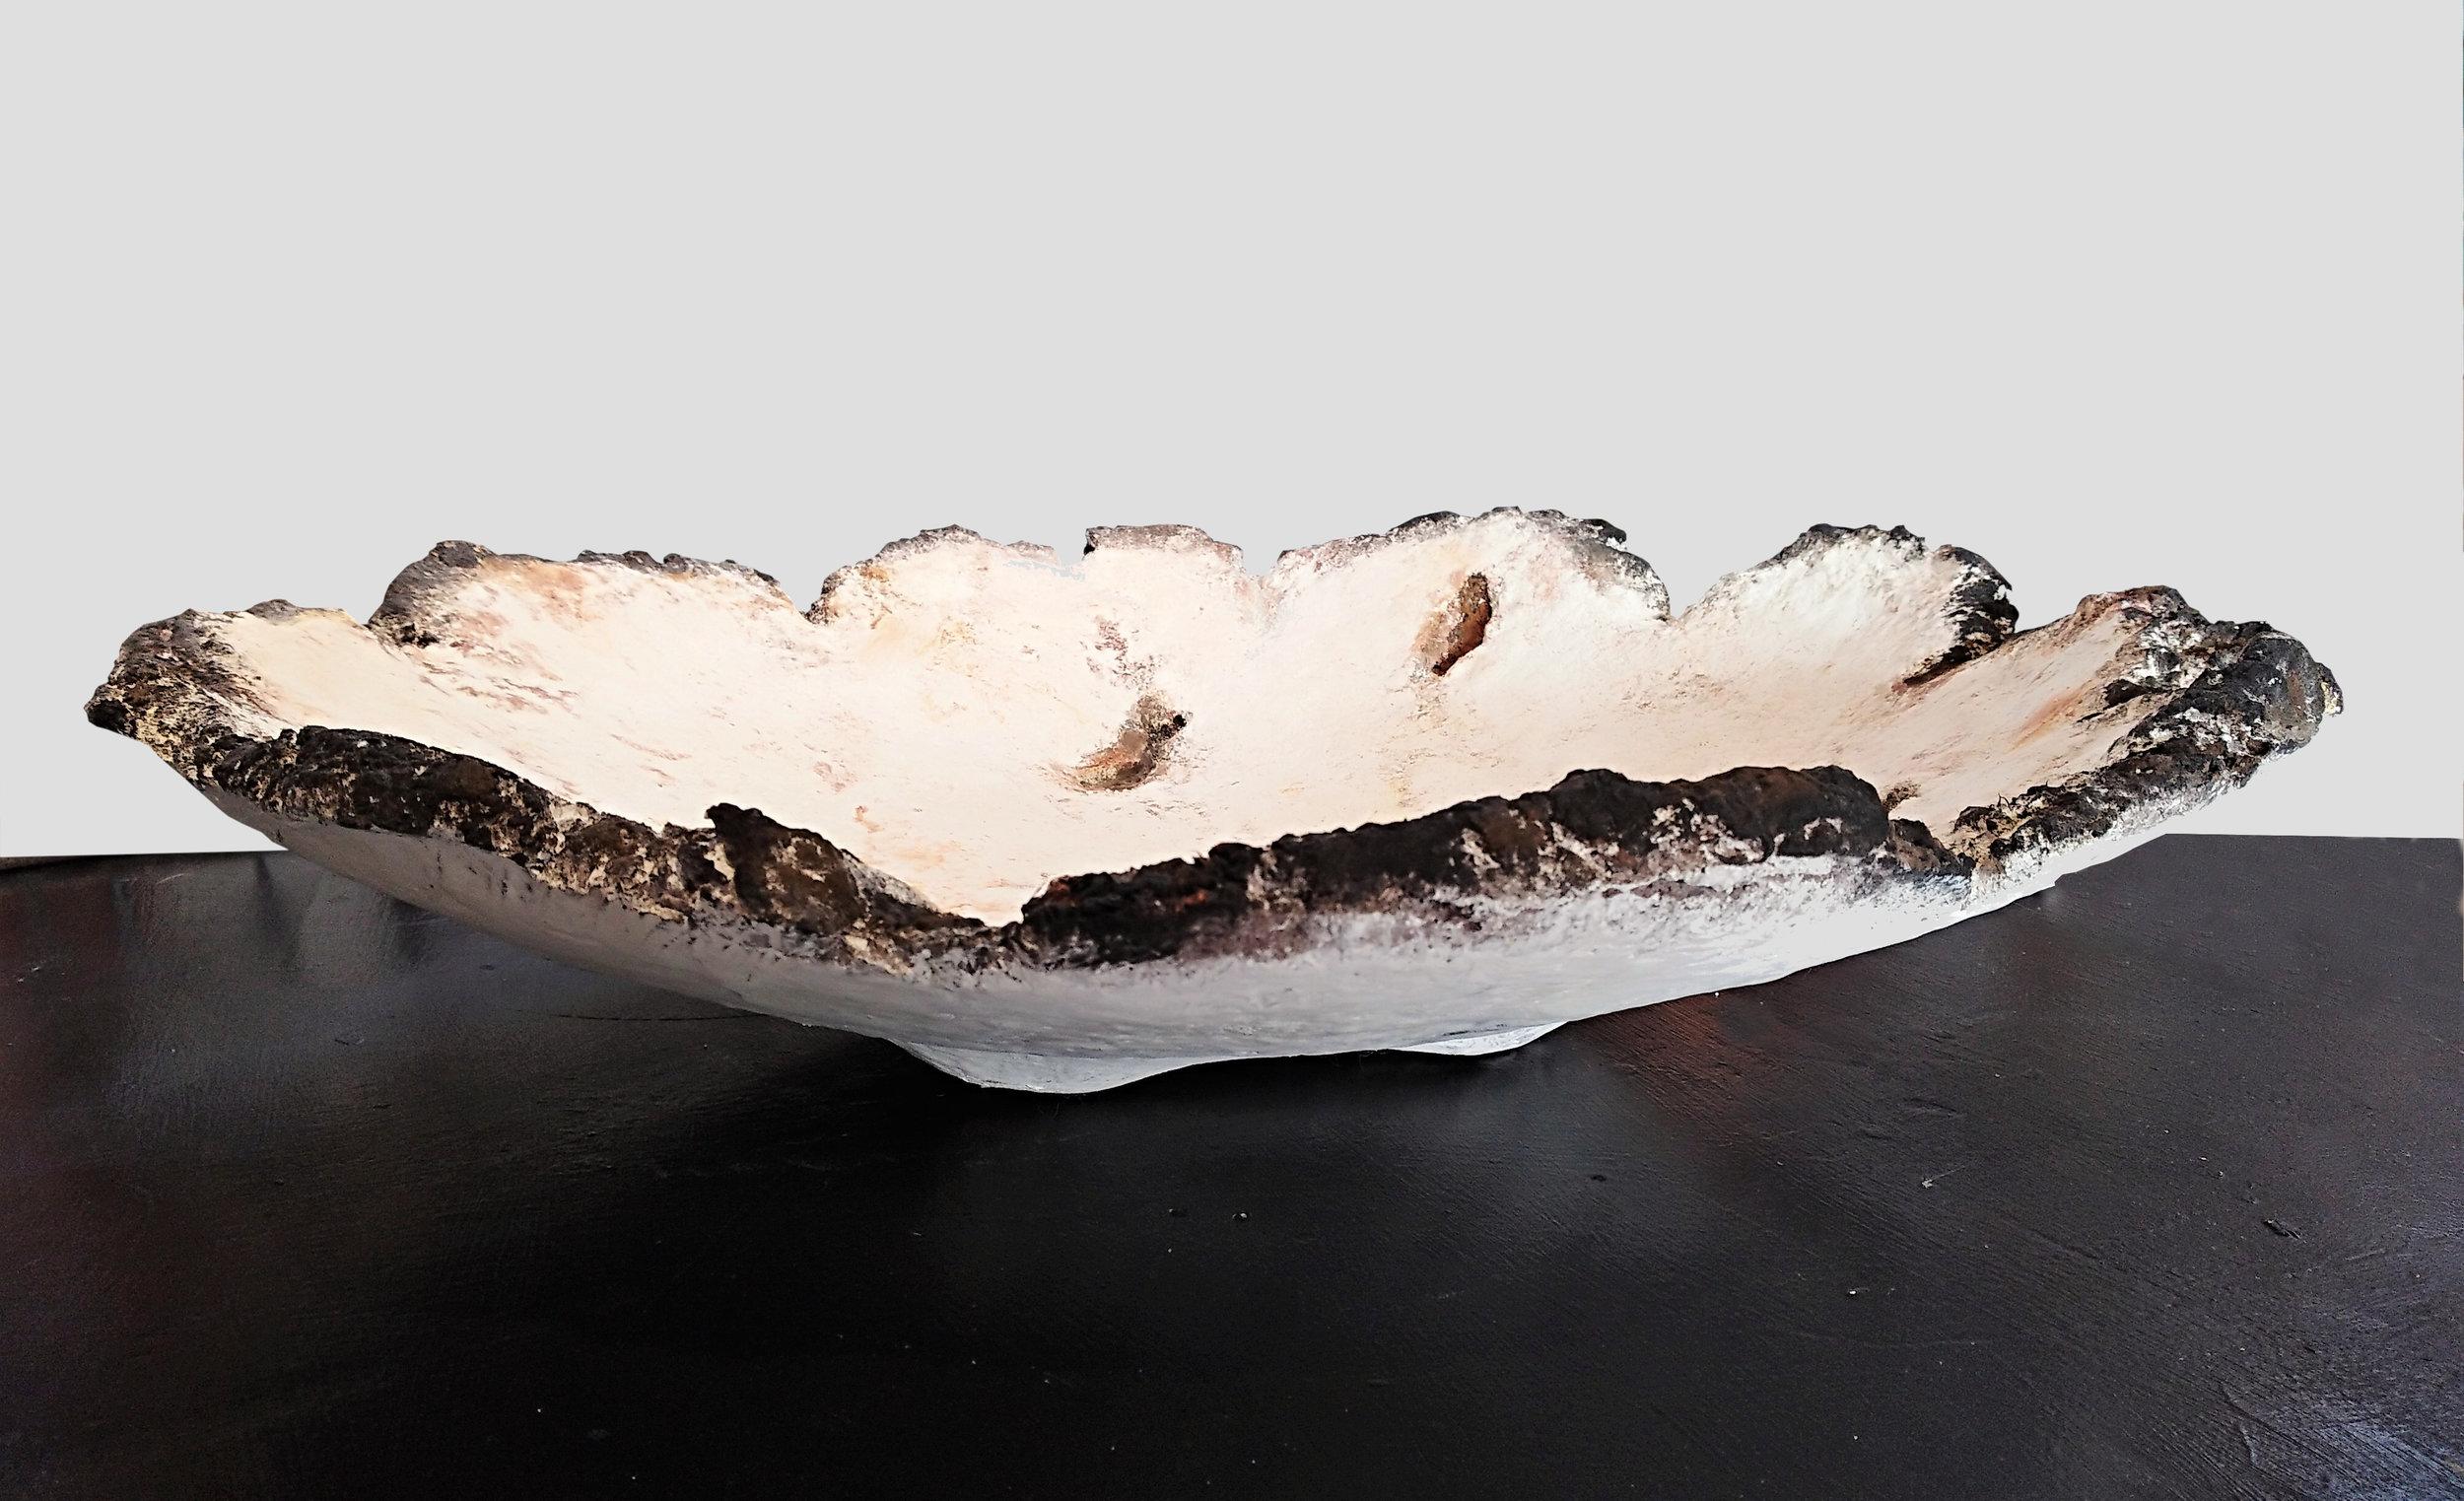 Jagged Crater Vessel  John Phillips, artis fiberclay  sold